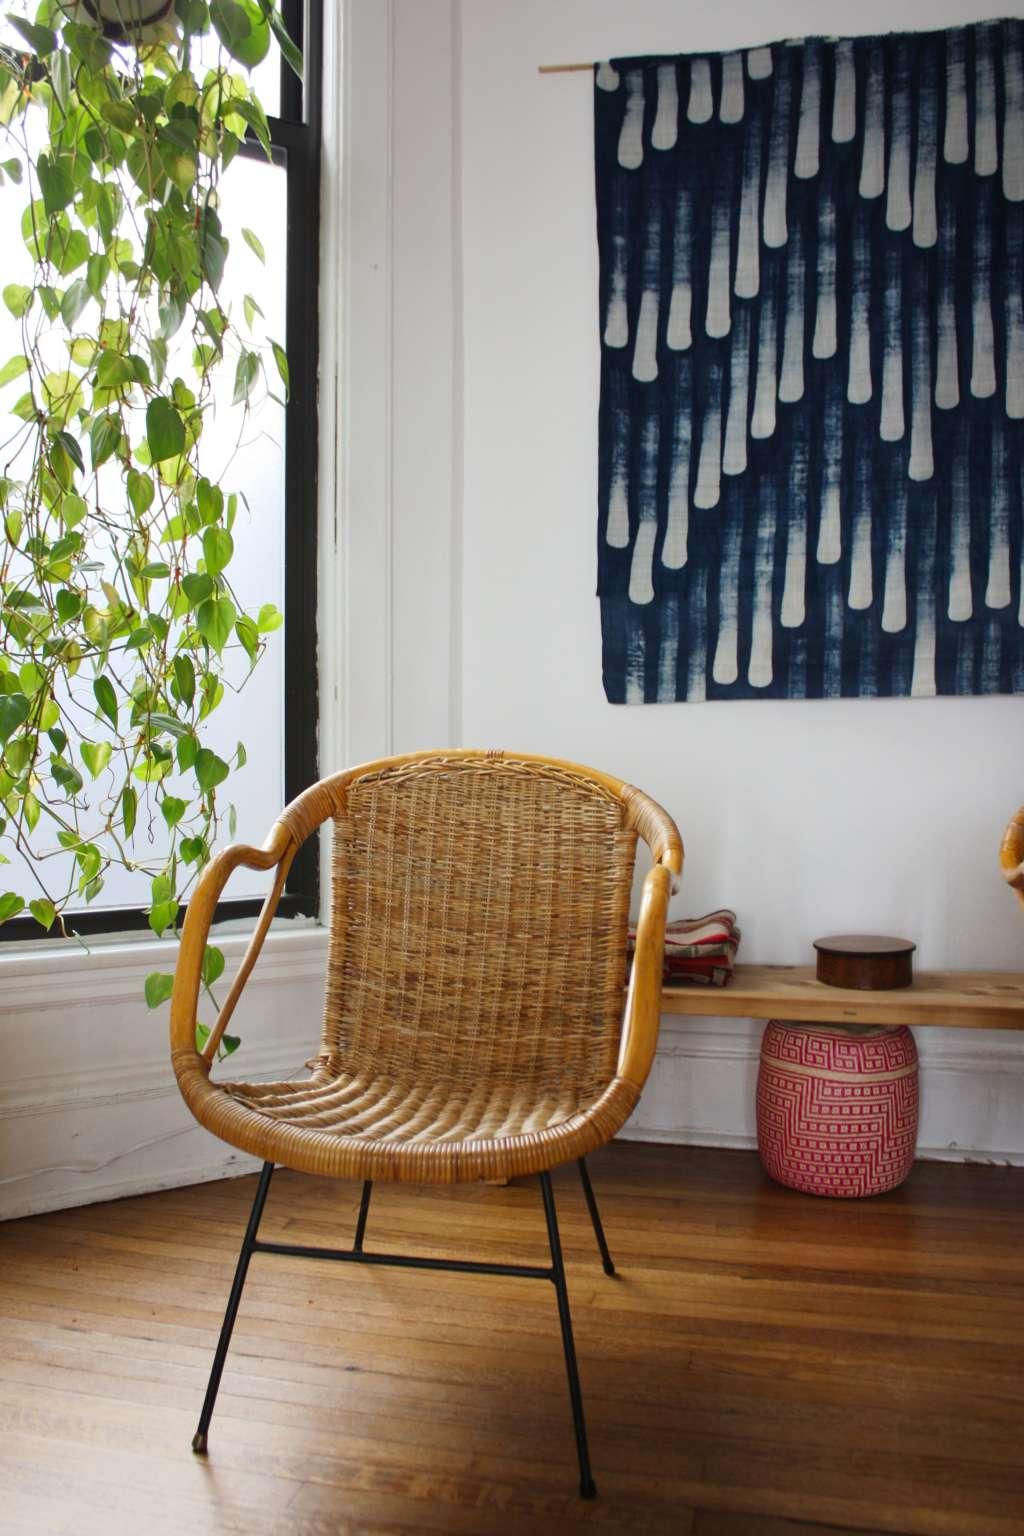 DIY Ideas: Using Fabric for Wall Art